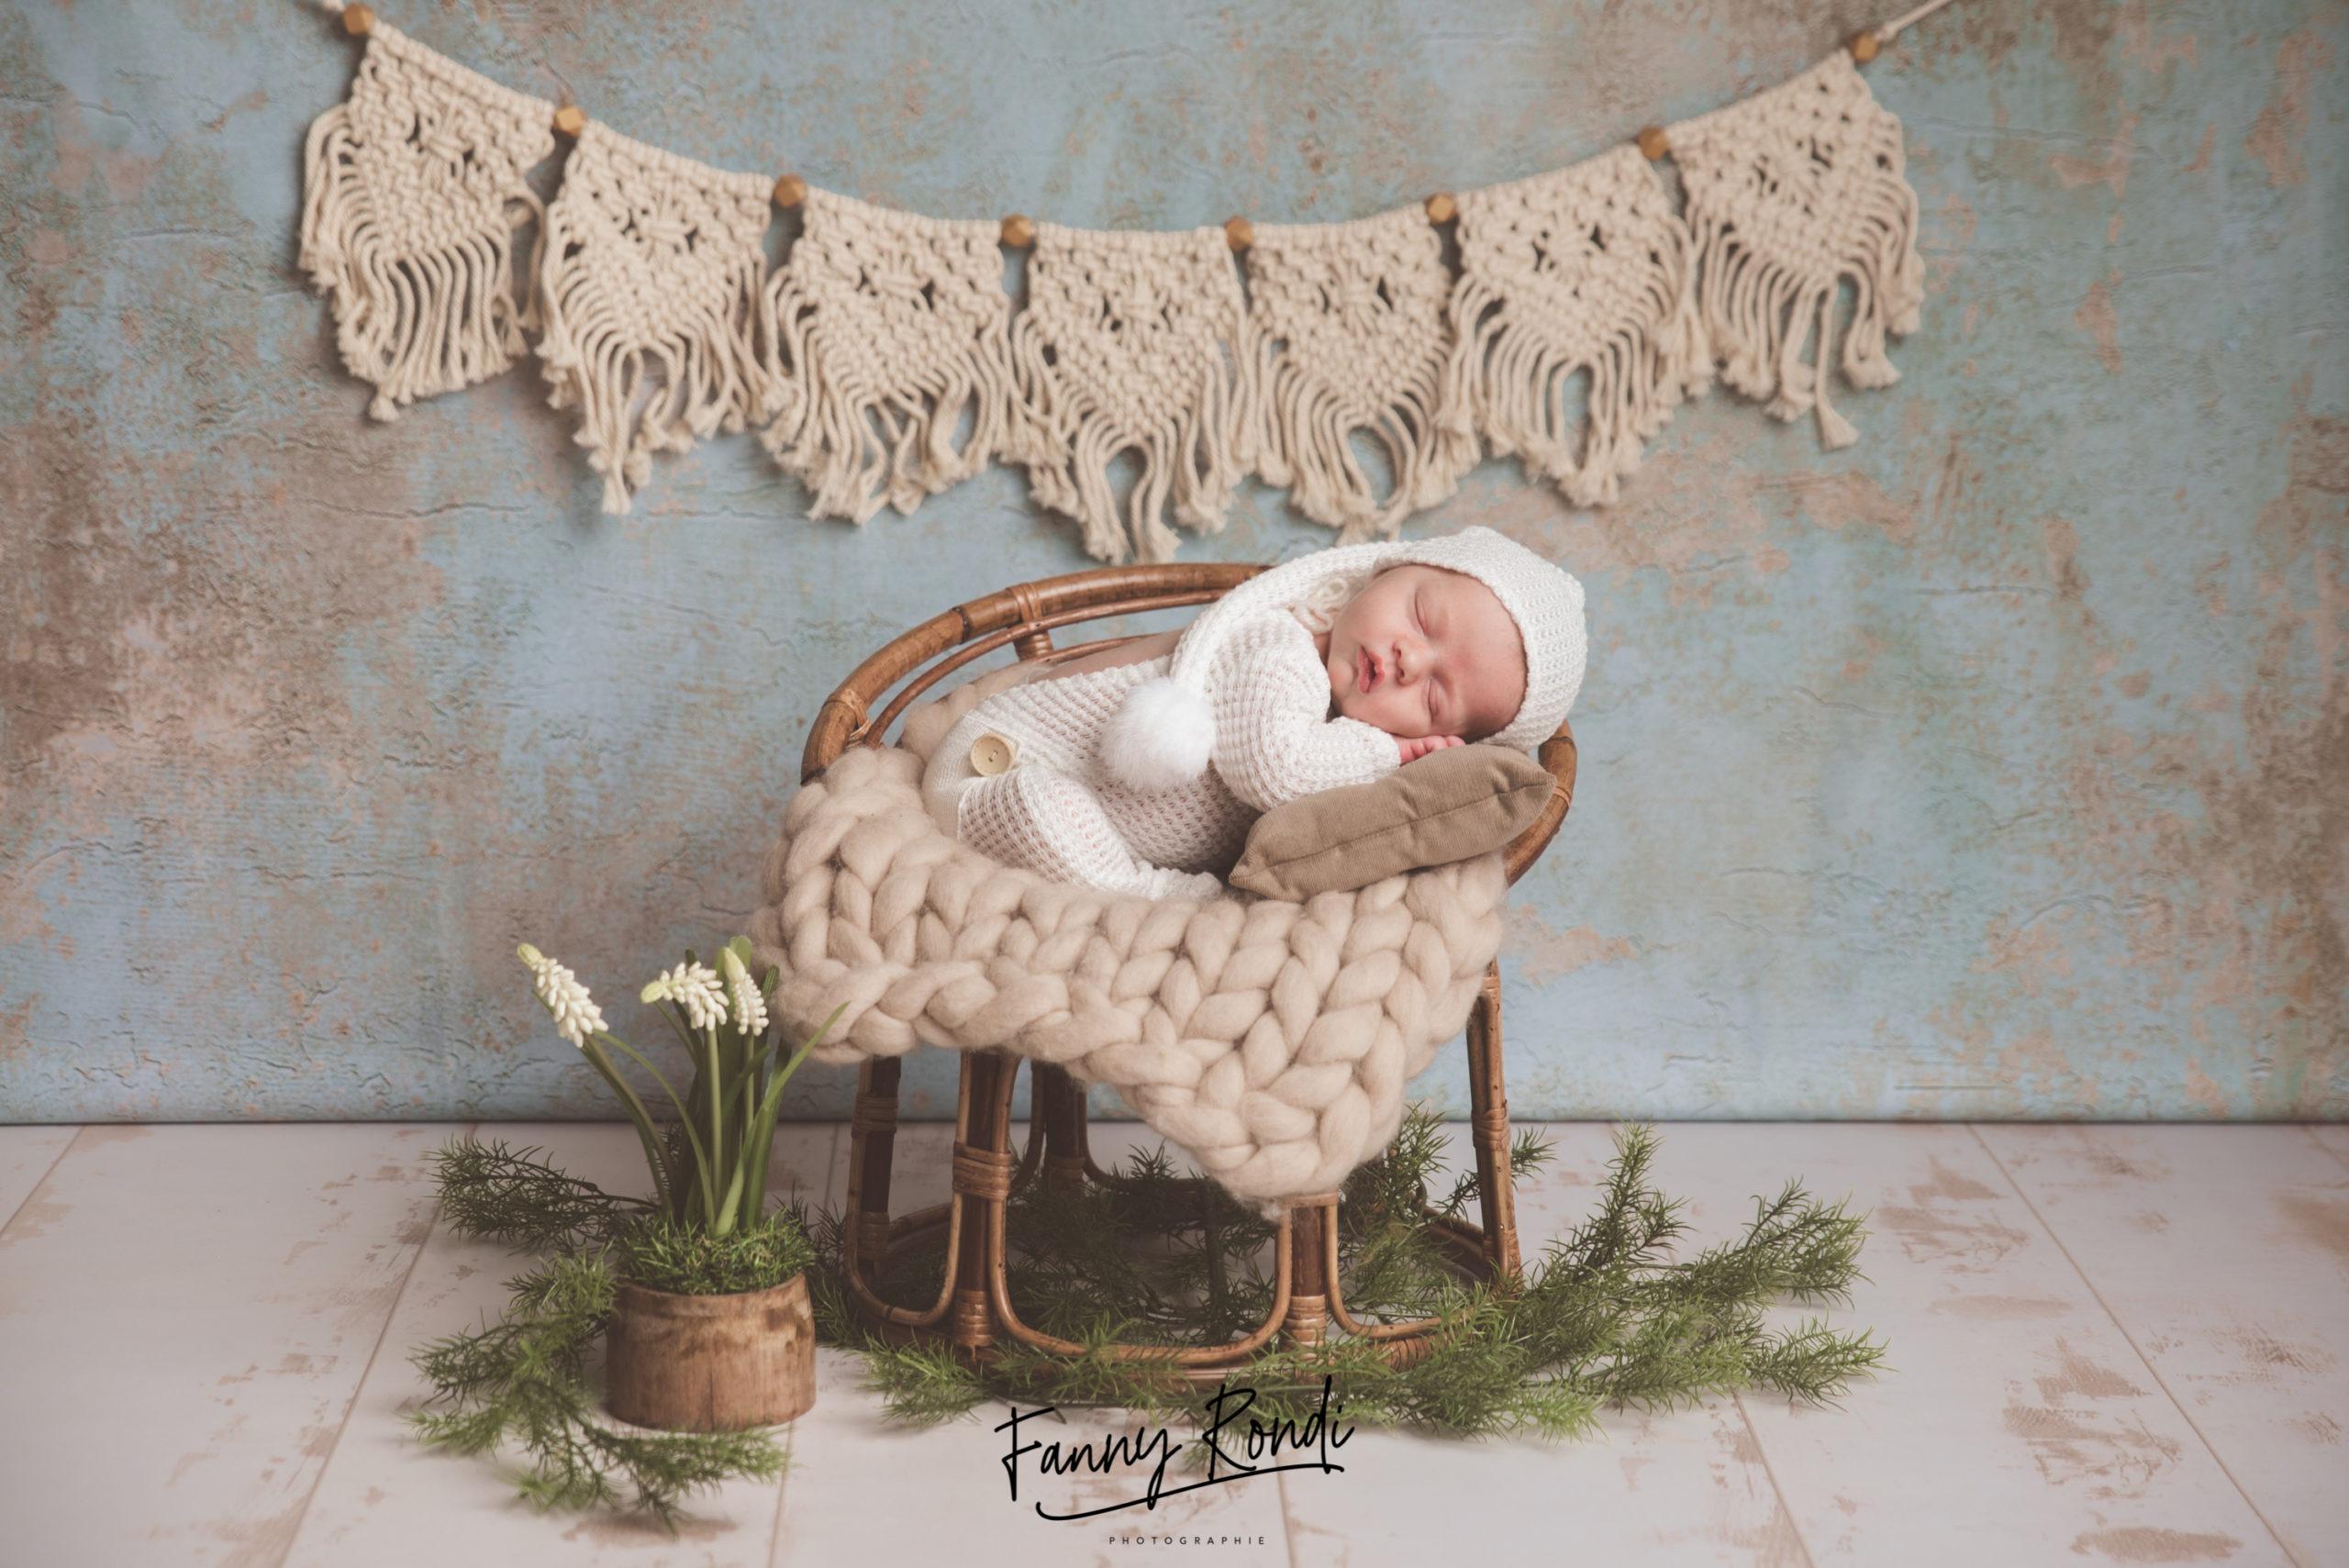 nouveau né endormi Dijon